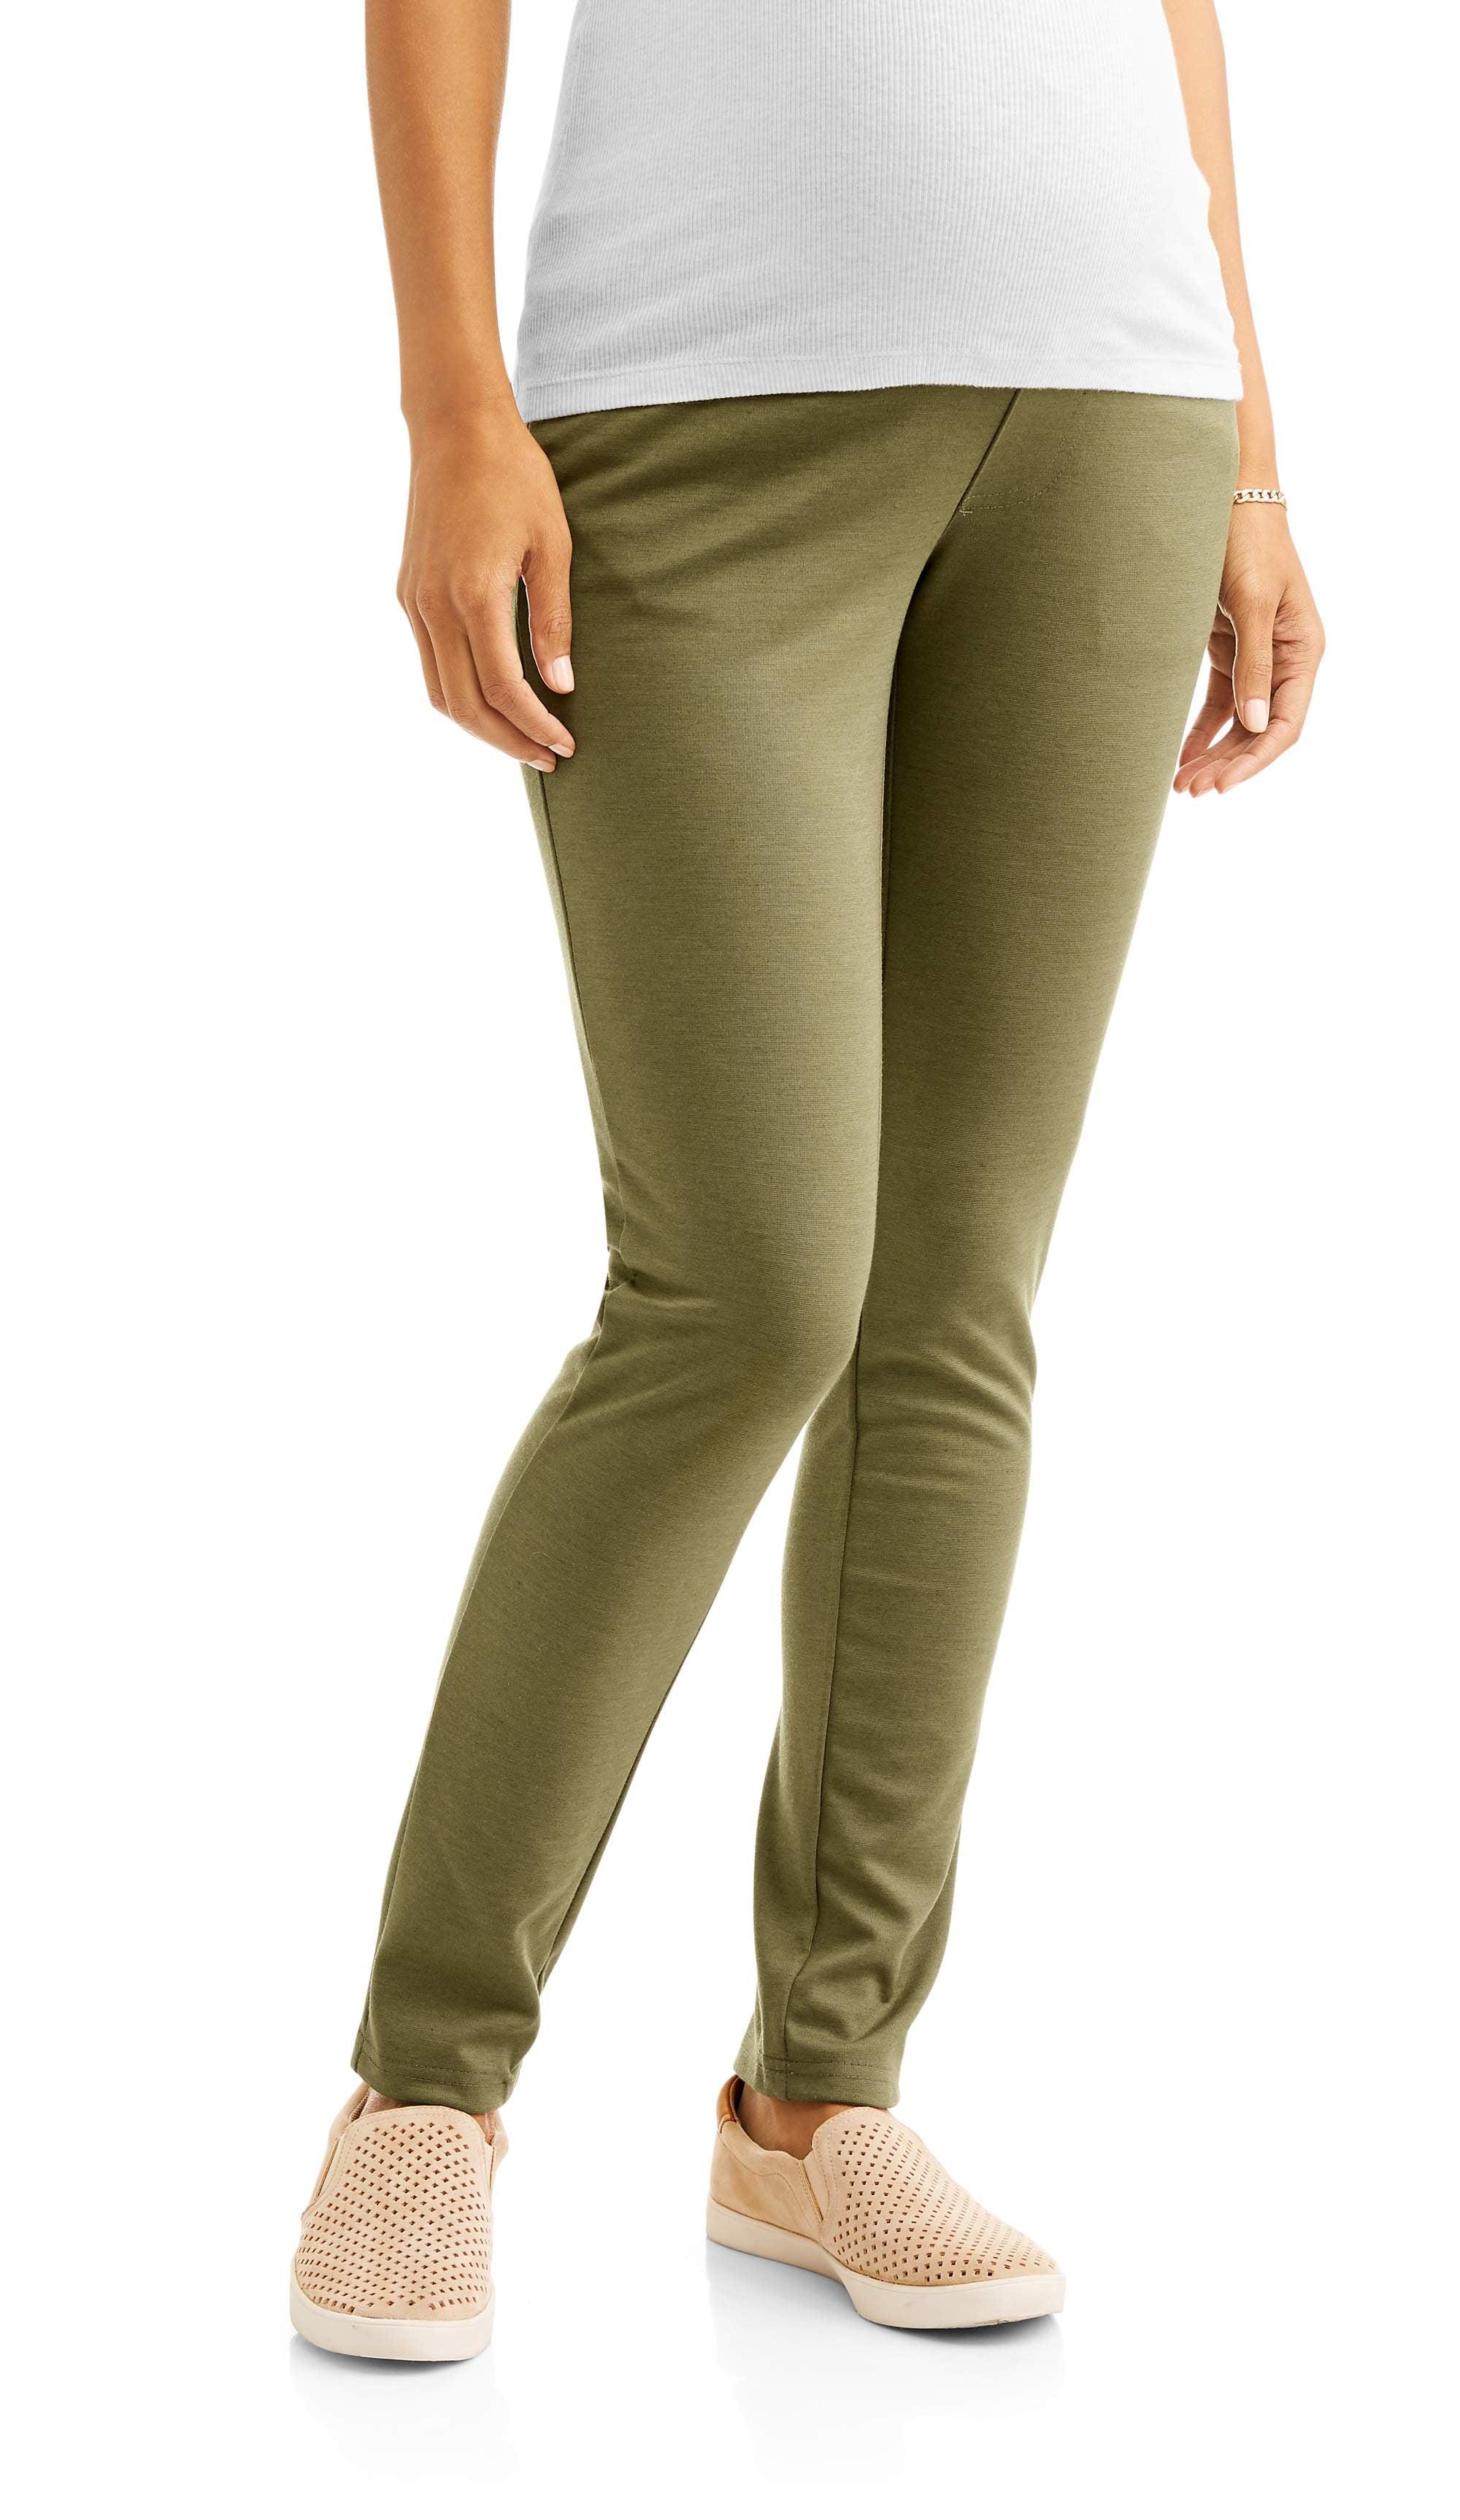 Maternity Full Panel Skinny Leg Stretchy Knit Ponte Pants by